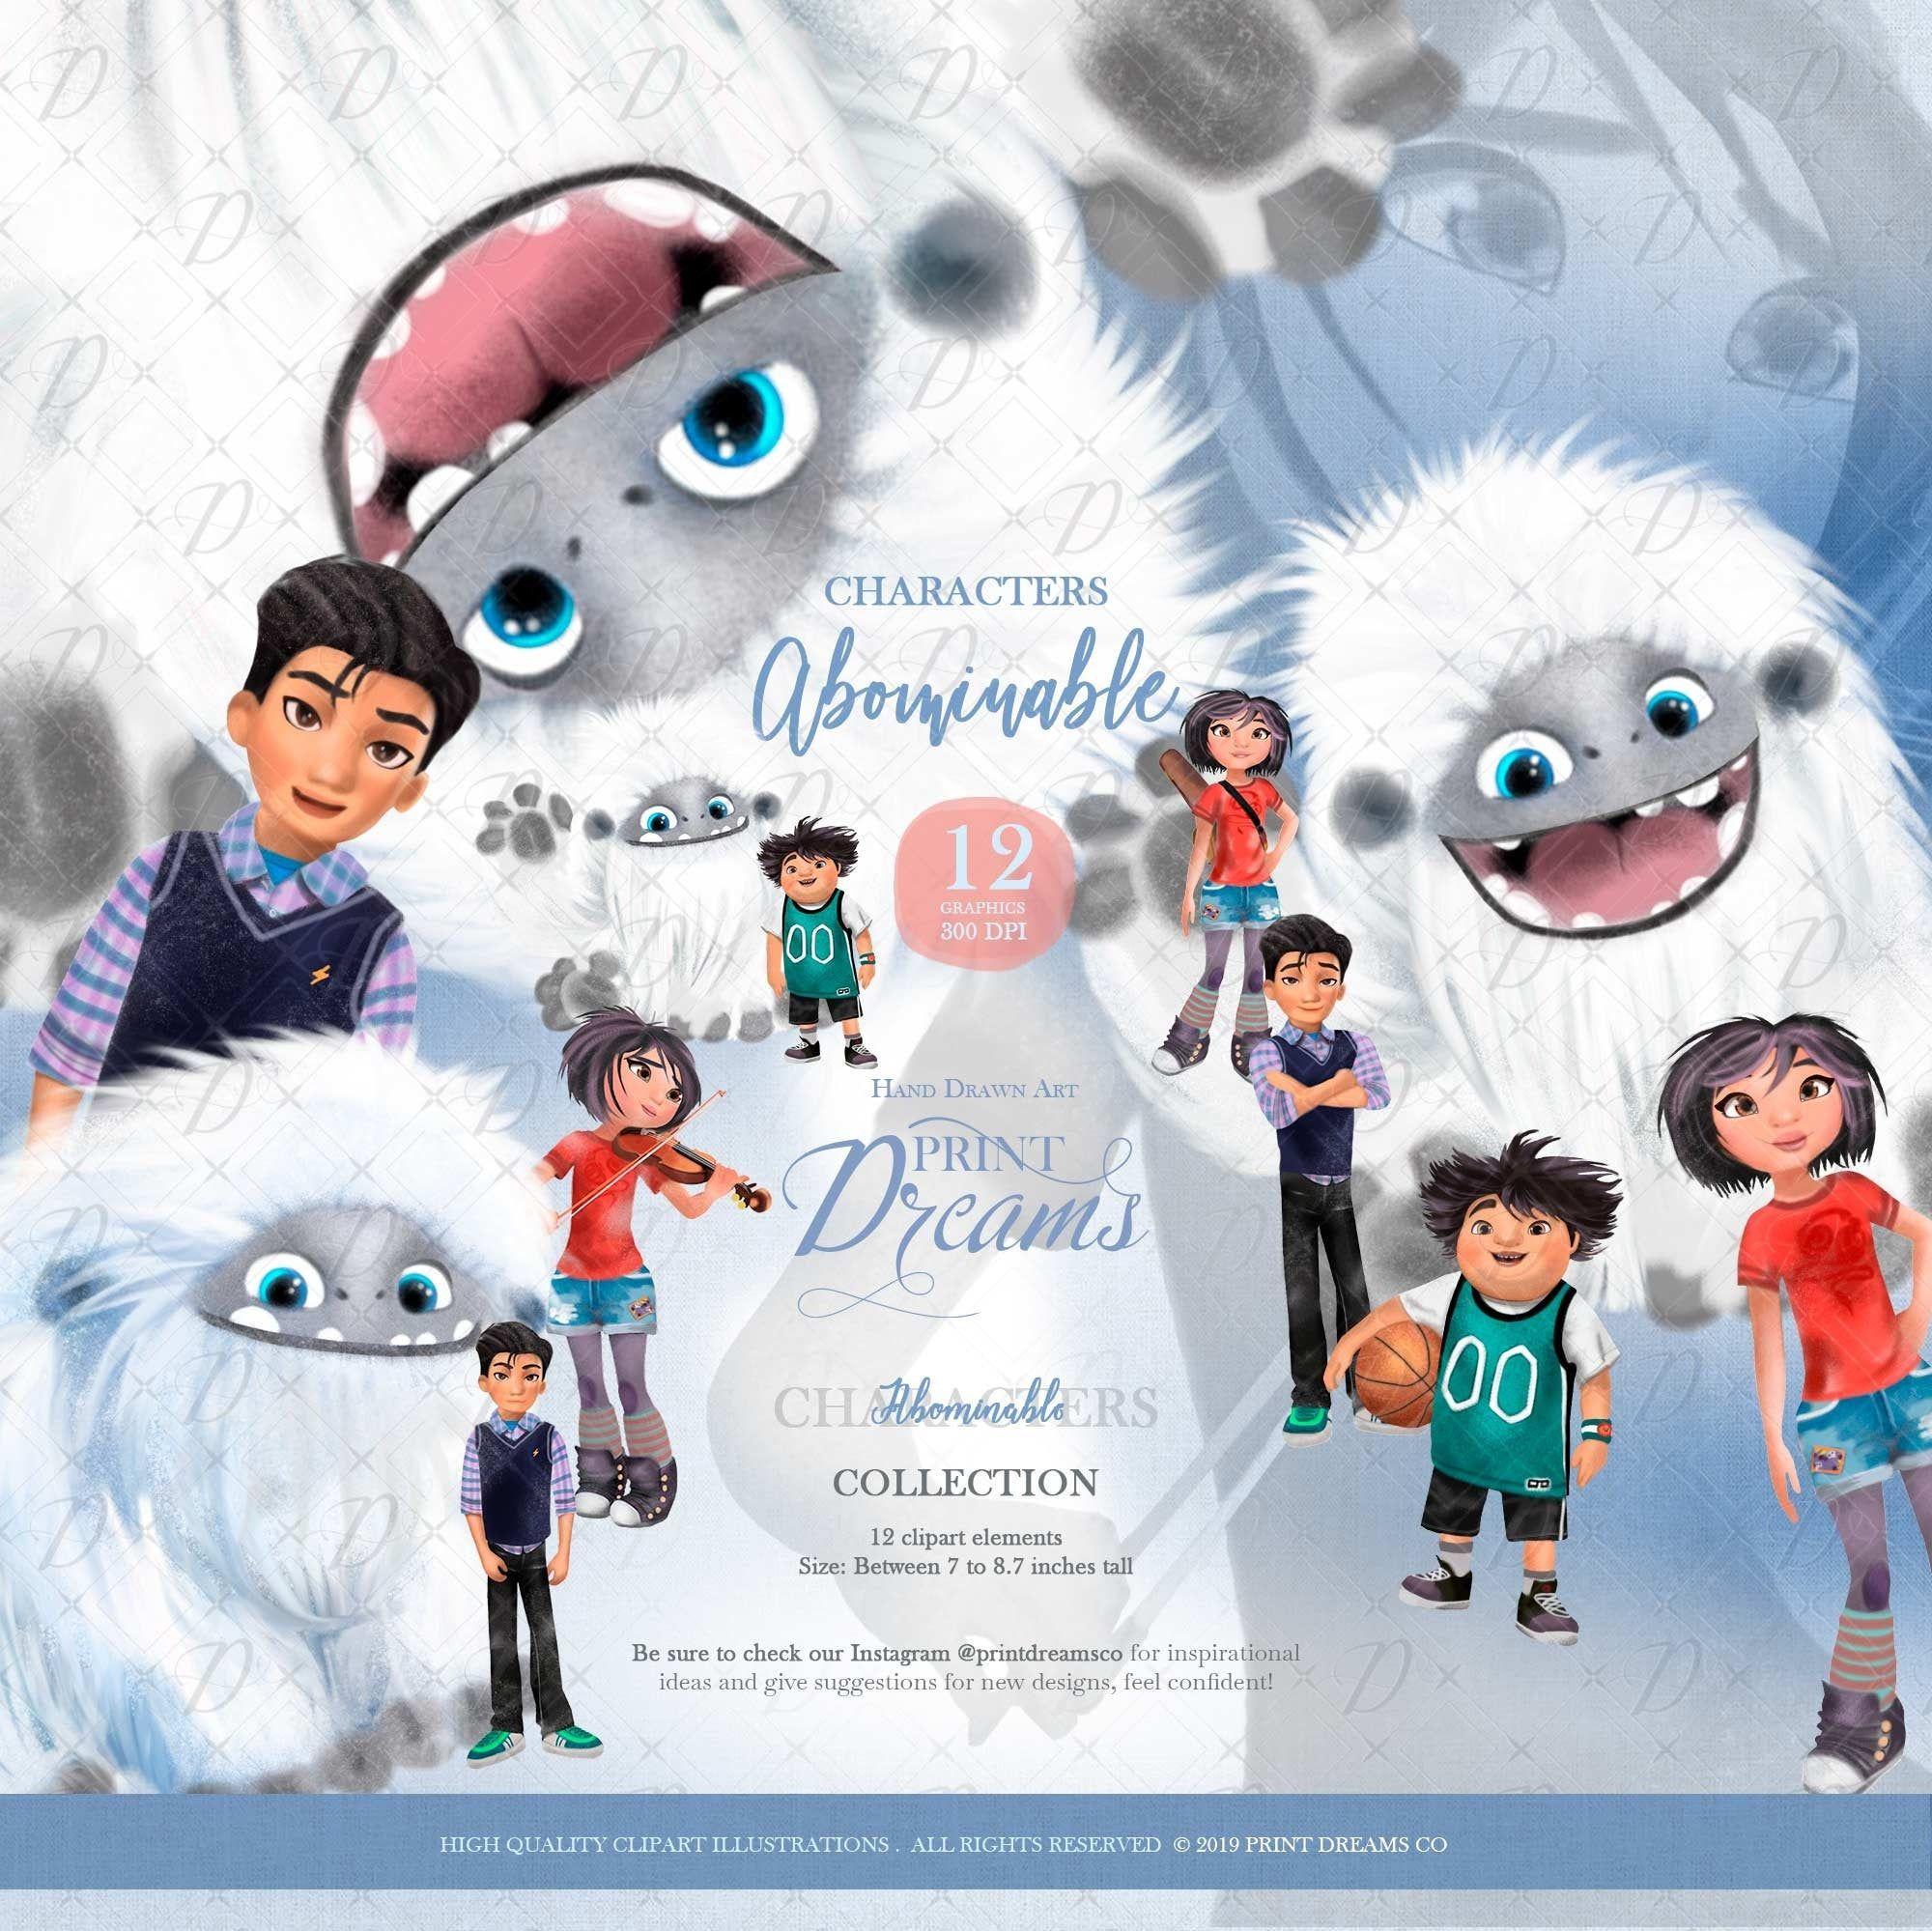 Abominable Clipart Abominable Characters Abominable Paper Abominable Movie Abominable Card Abominable Invitation Abominable Birthday En 2021 Clipart Album De Recuerdos Ilustraciones